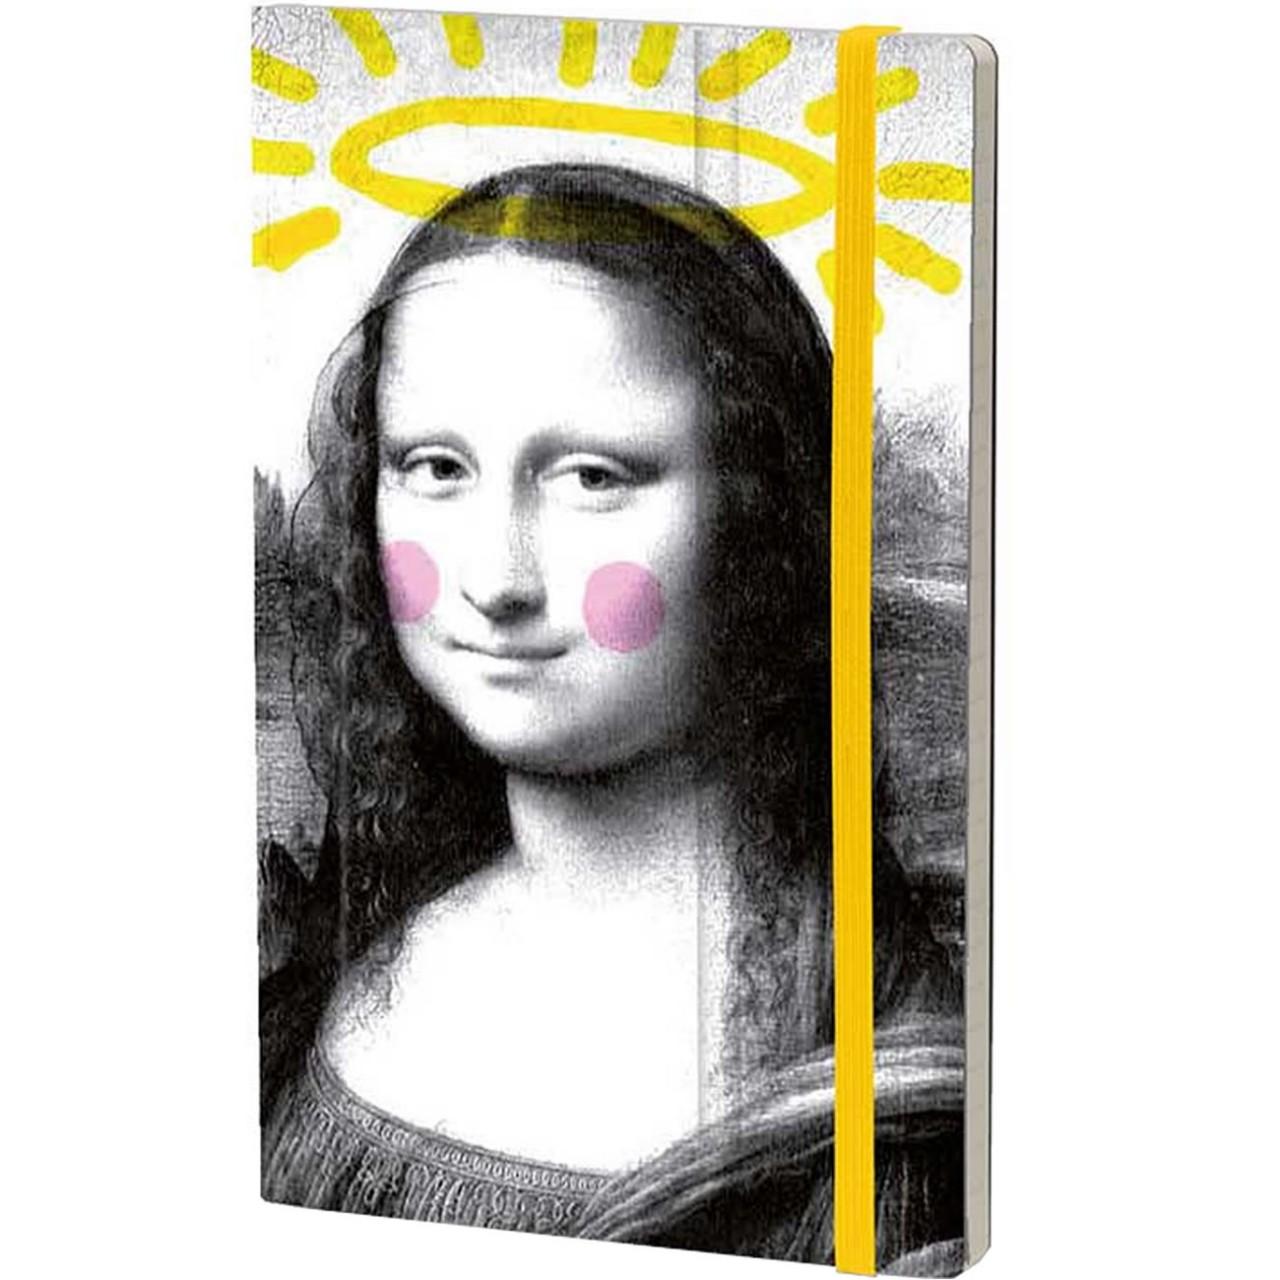 Stifflexible Notizbuch ART 13 x 21 cm 192 S., ANGEL